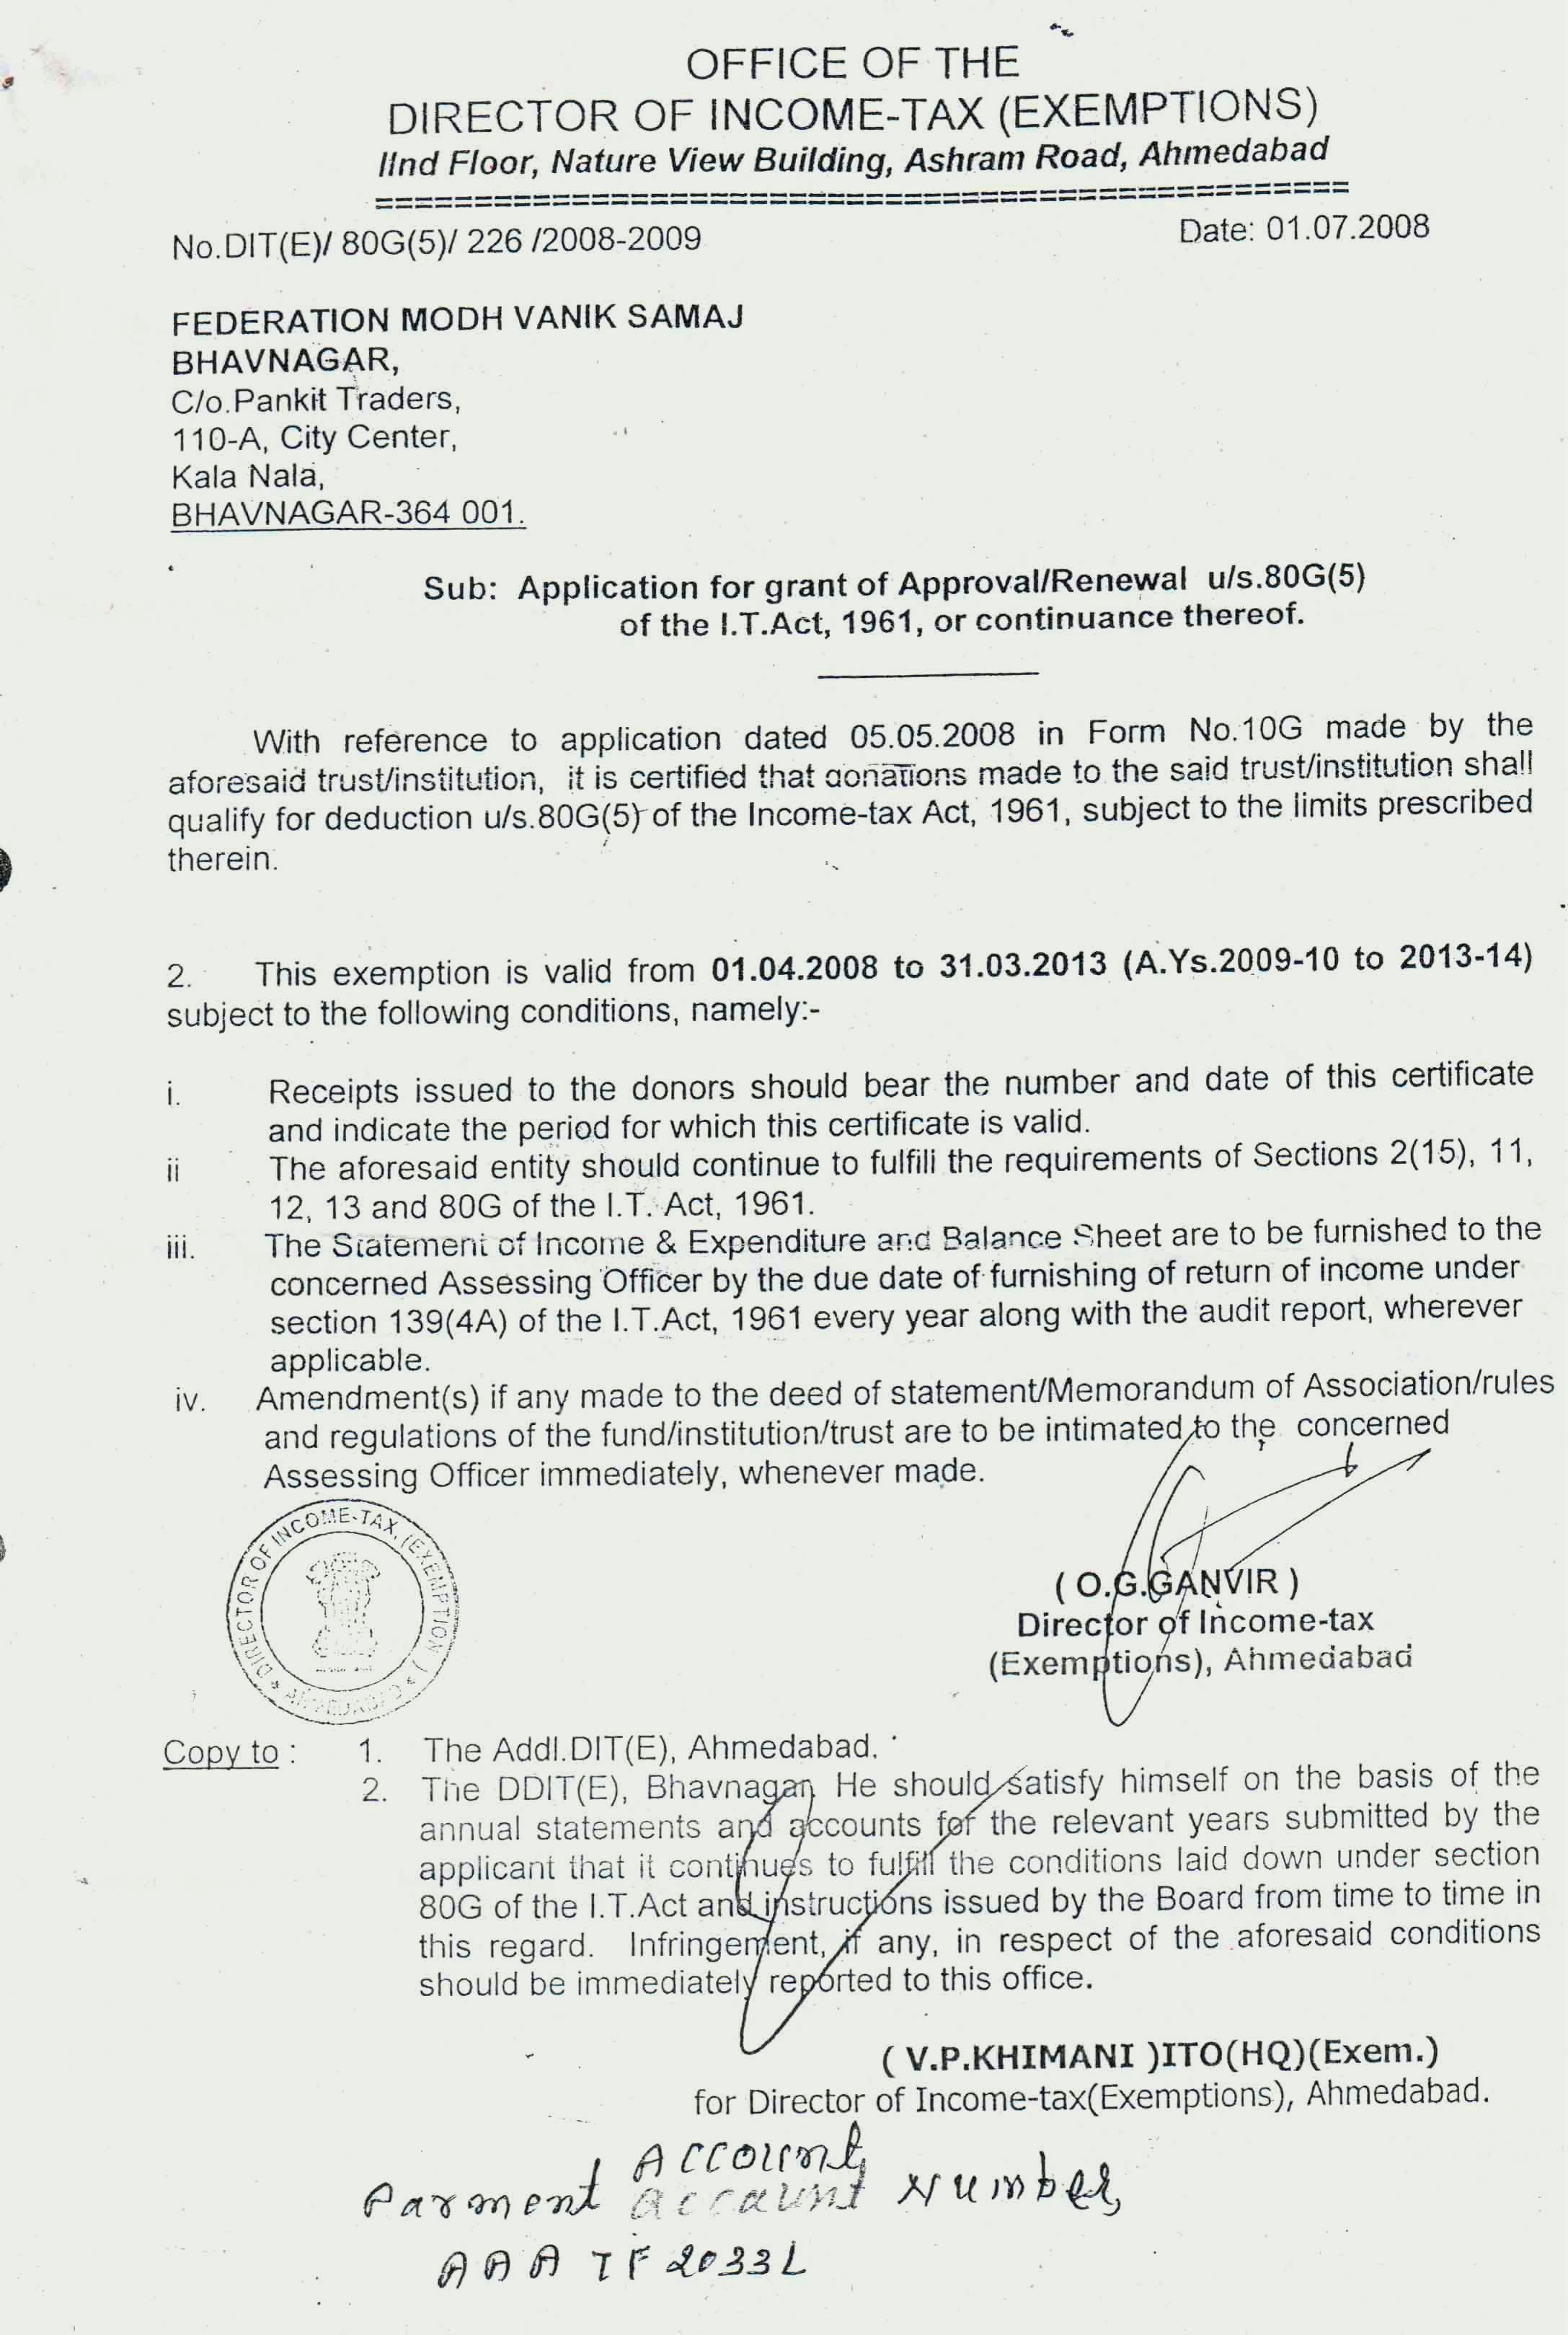 Federation Modh Vanik Samaj Home Page – Students Loan Application Form